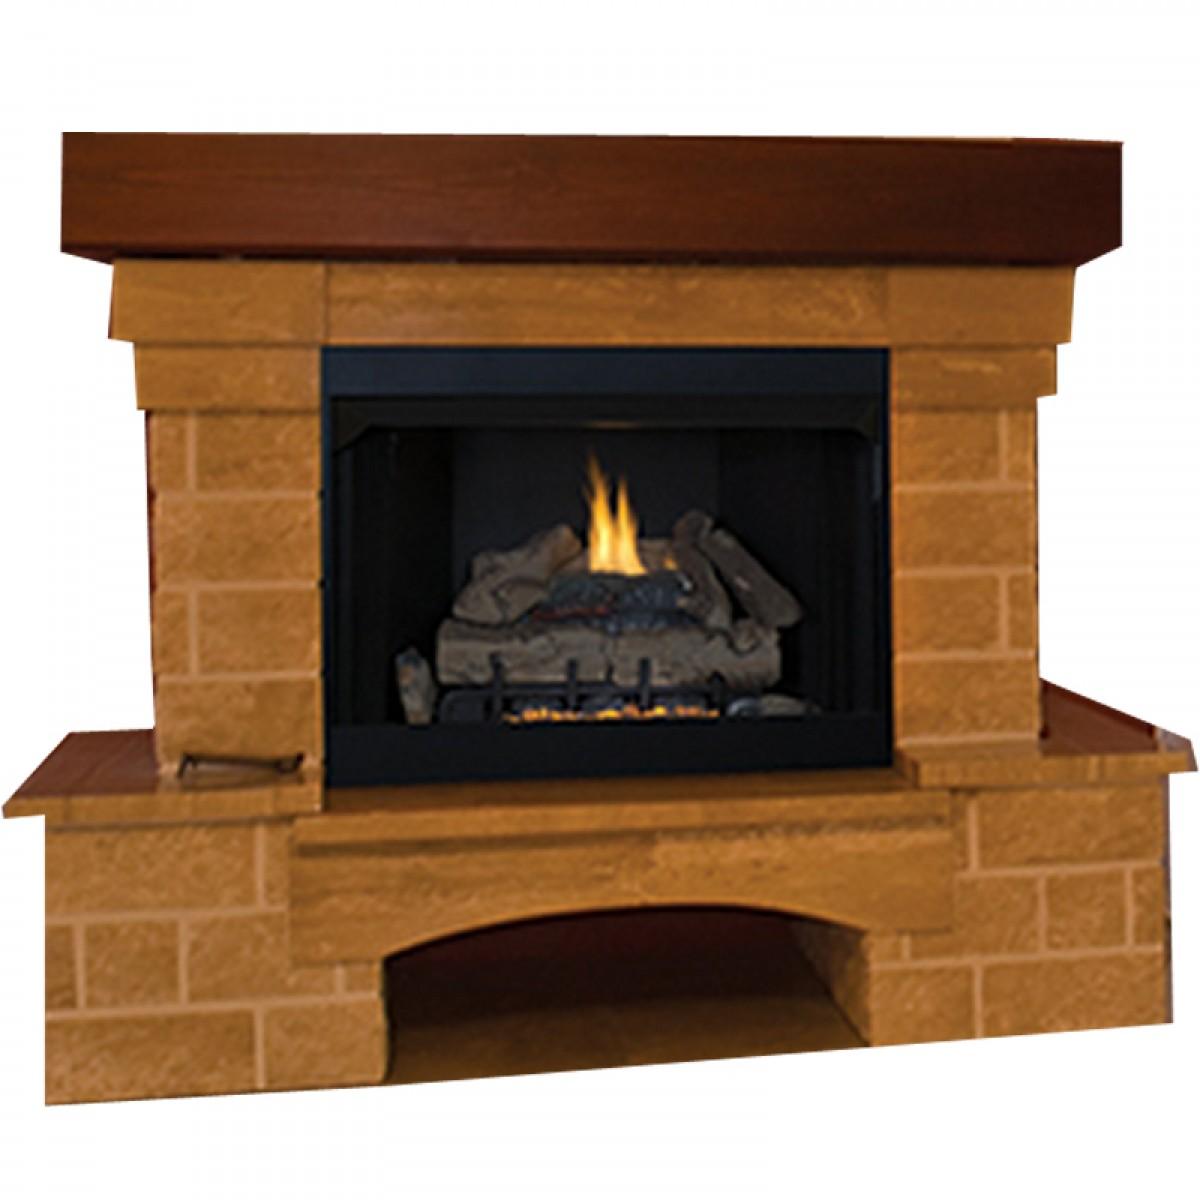 Ihp Superior Vrt Vct2000 Universal Vent Free Gas Firebox